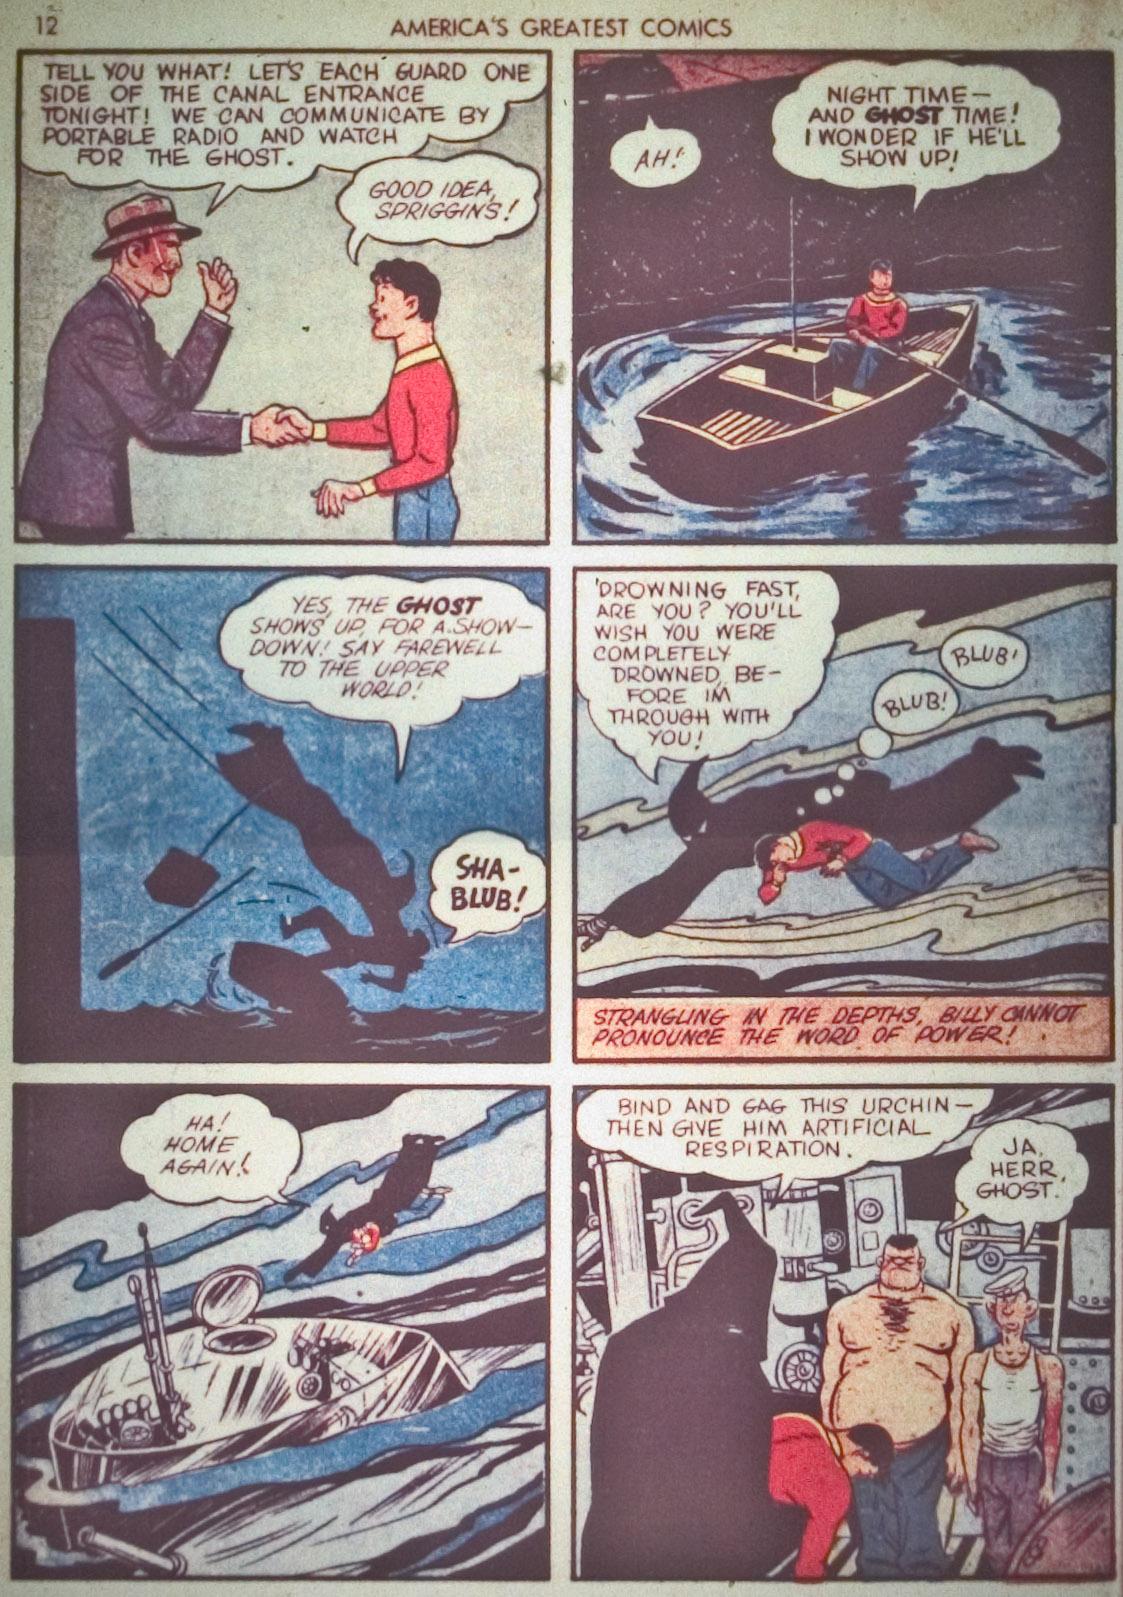 Read online America's Greatest Comics comic -  Issue #1 - 15